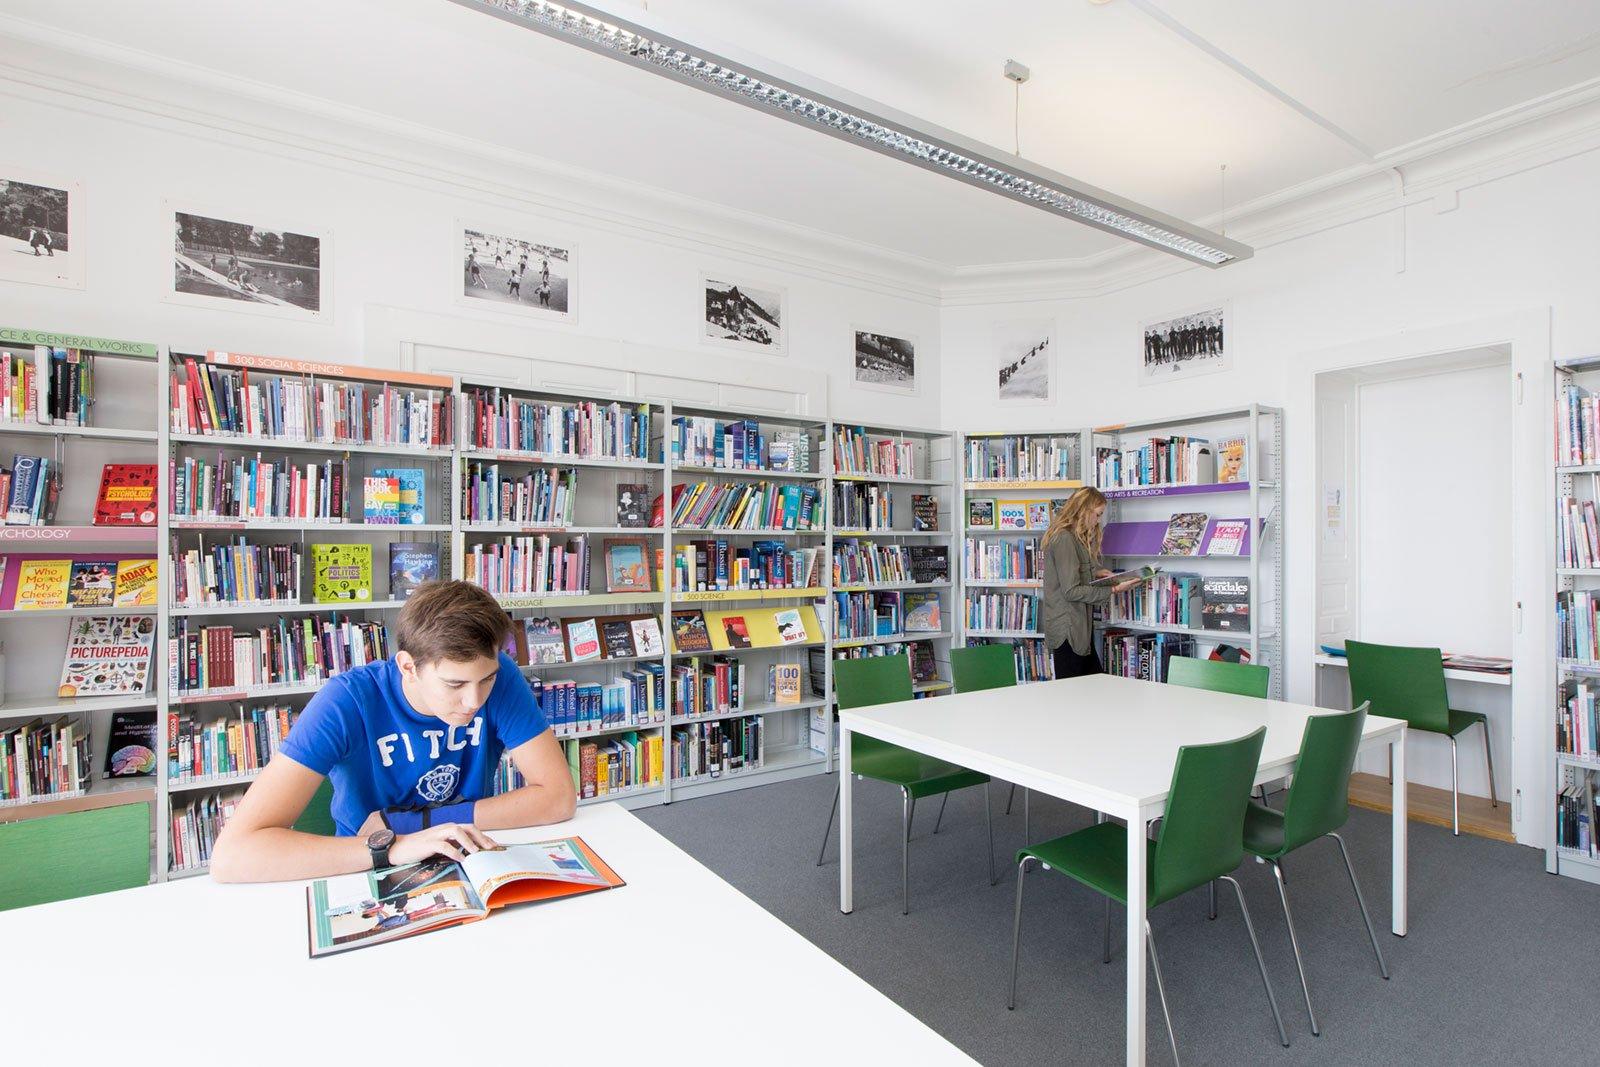 202-library-studying-brillantmont-Lausanne-Switzerland